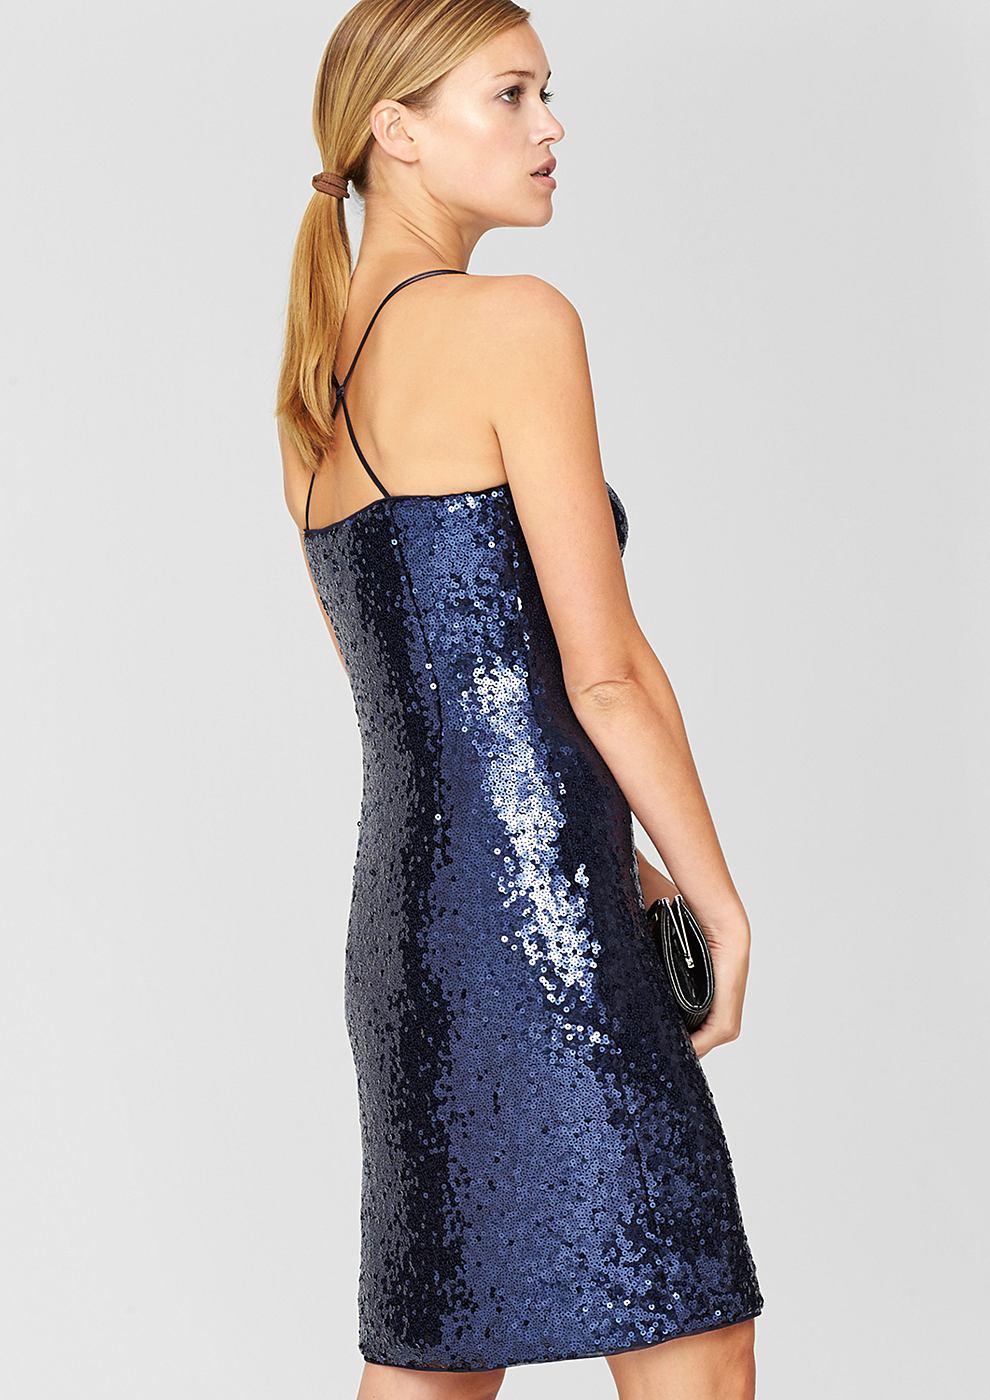 s.Oliver Premium Accentuerende jurk met pailletjes blauw